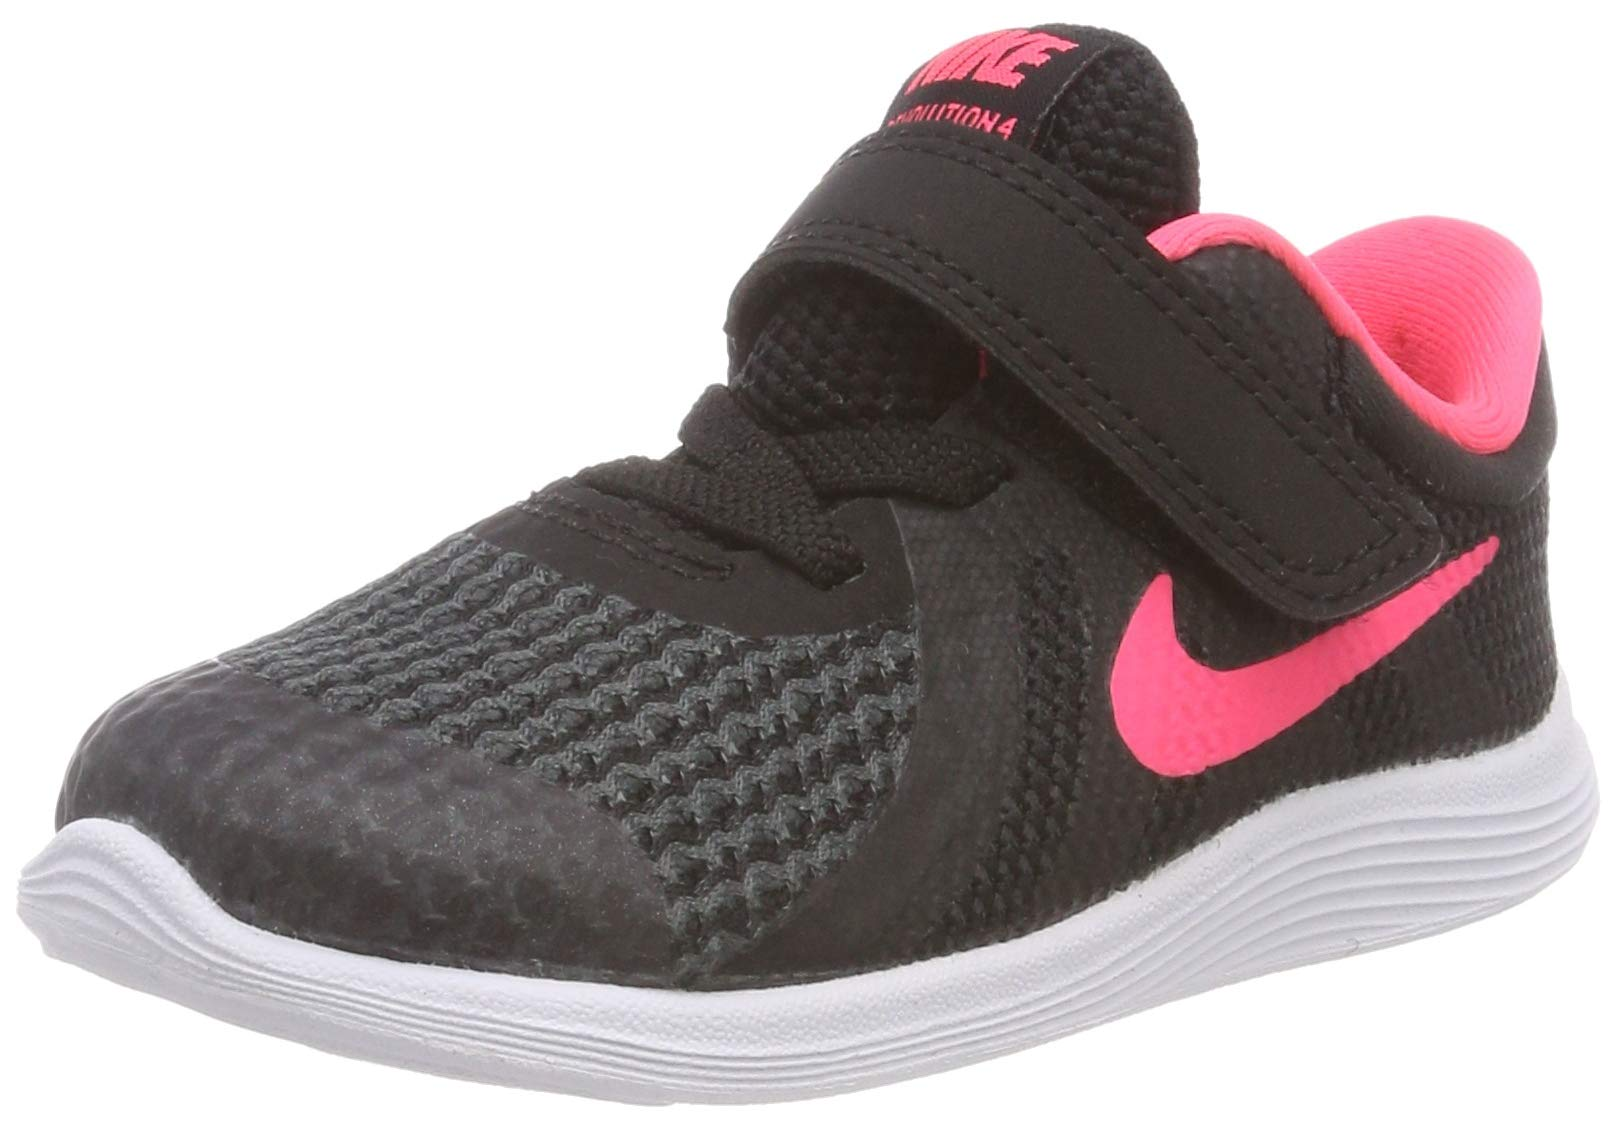 Nike Girls' Revolution 4 (TDV) Running Shoe, Black/Racer Pink - White, 8C Regular US Toddler by Nike